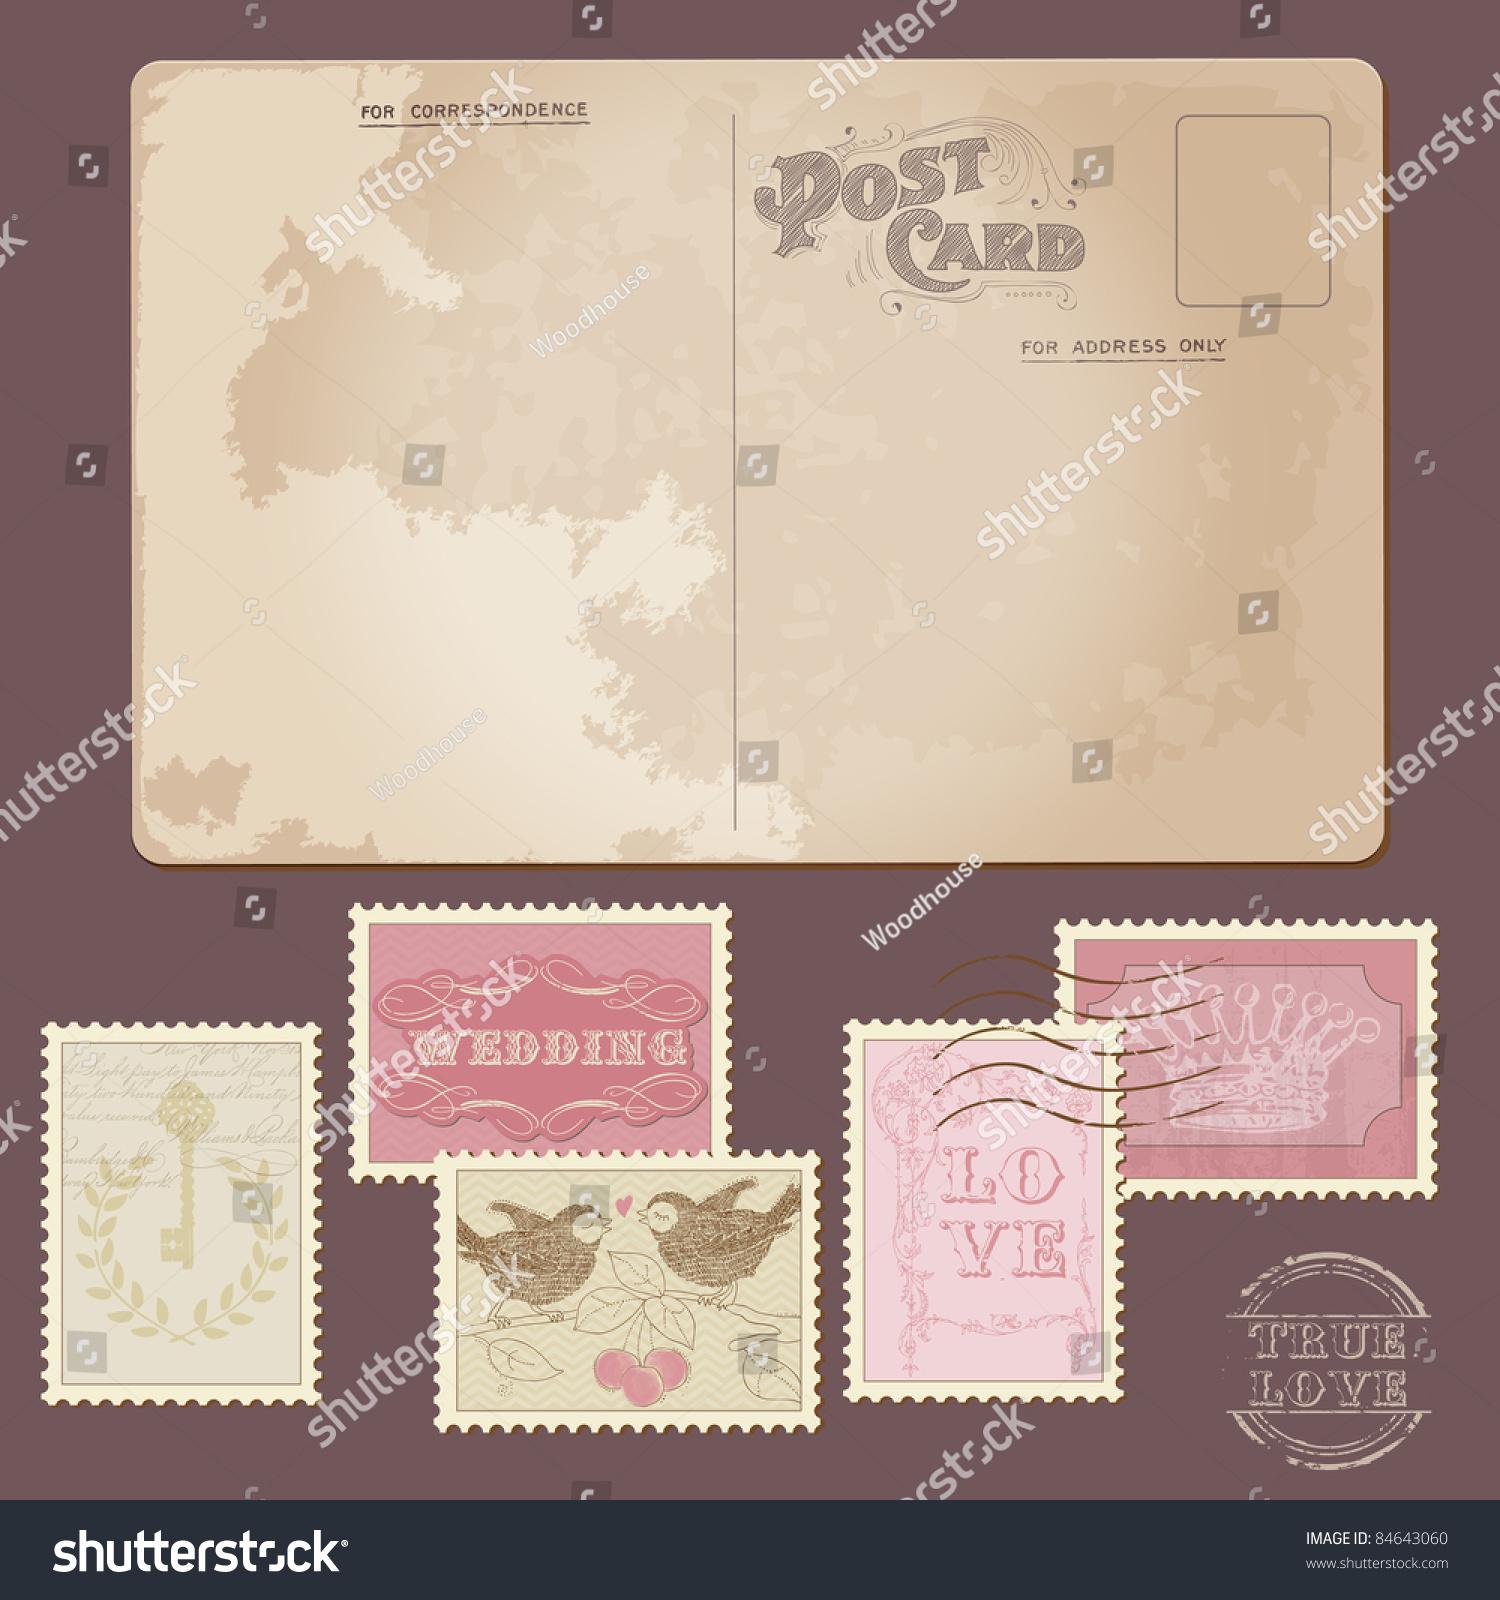 Old Postcard Wedding Postage Stamps Design Stock Vector